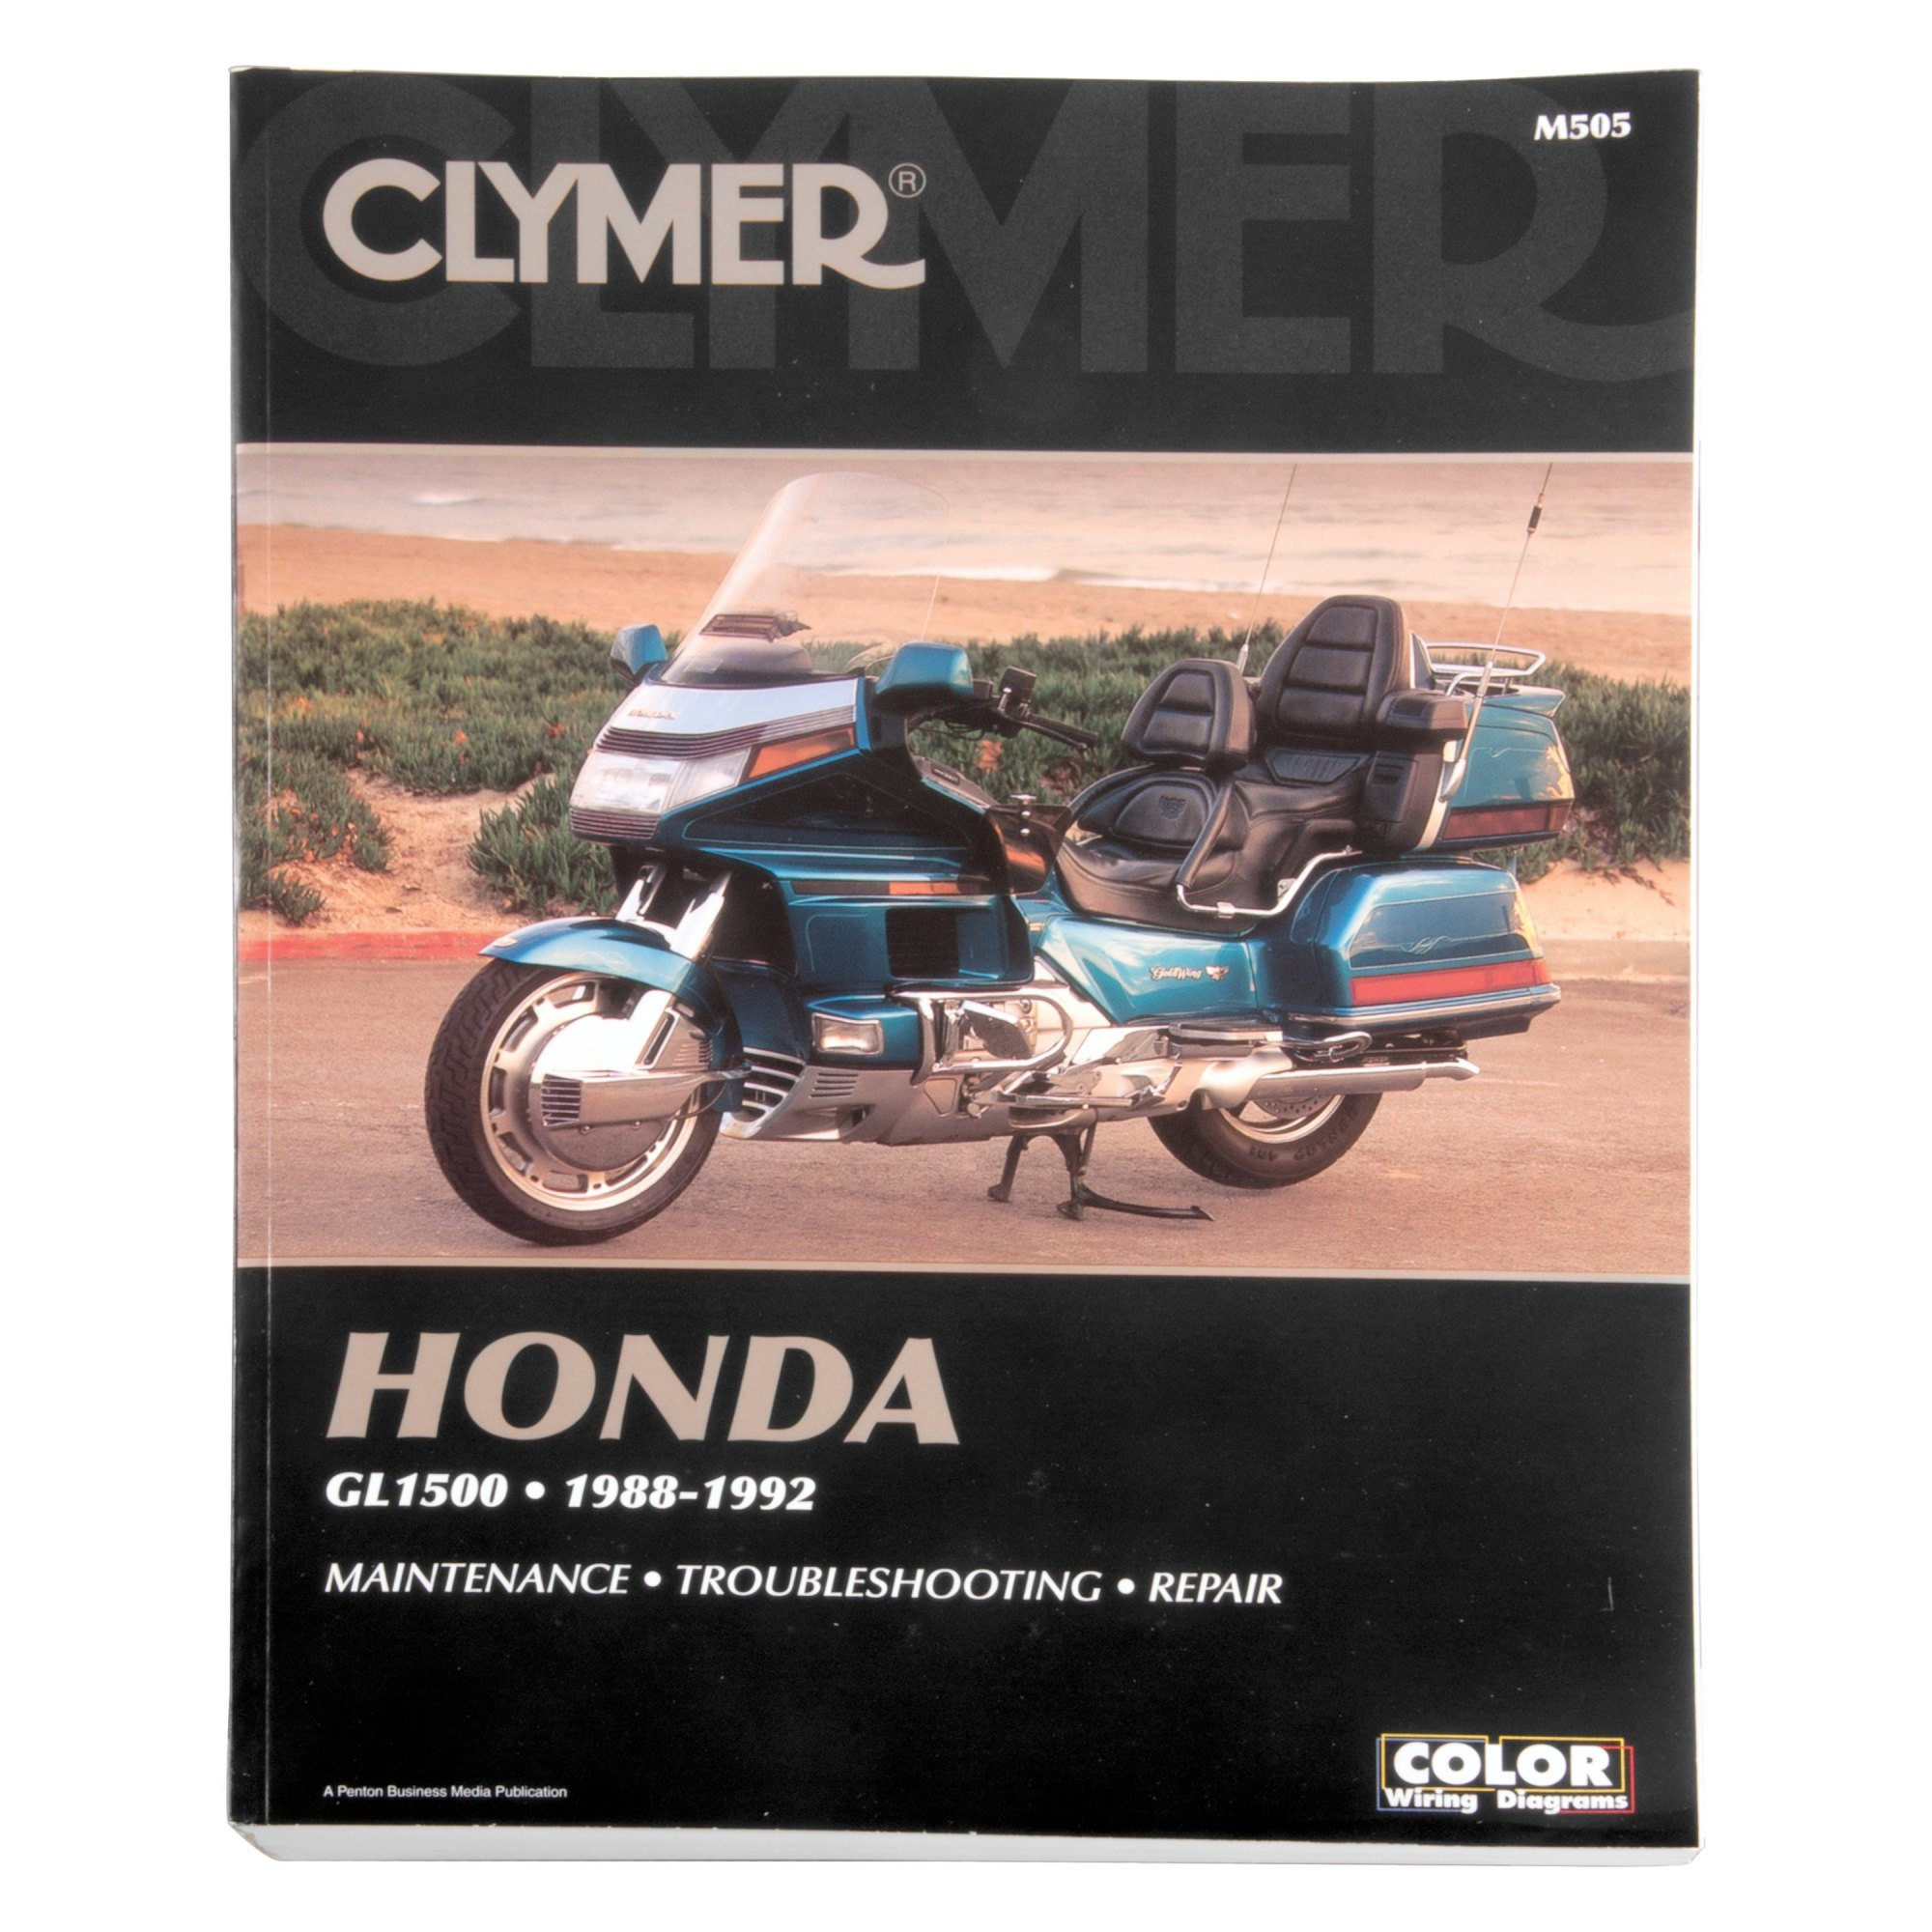 hight resolution of  1988 honda gl1500 goldwing honda gl1500 gold wing 1988 1992 manual